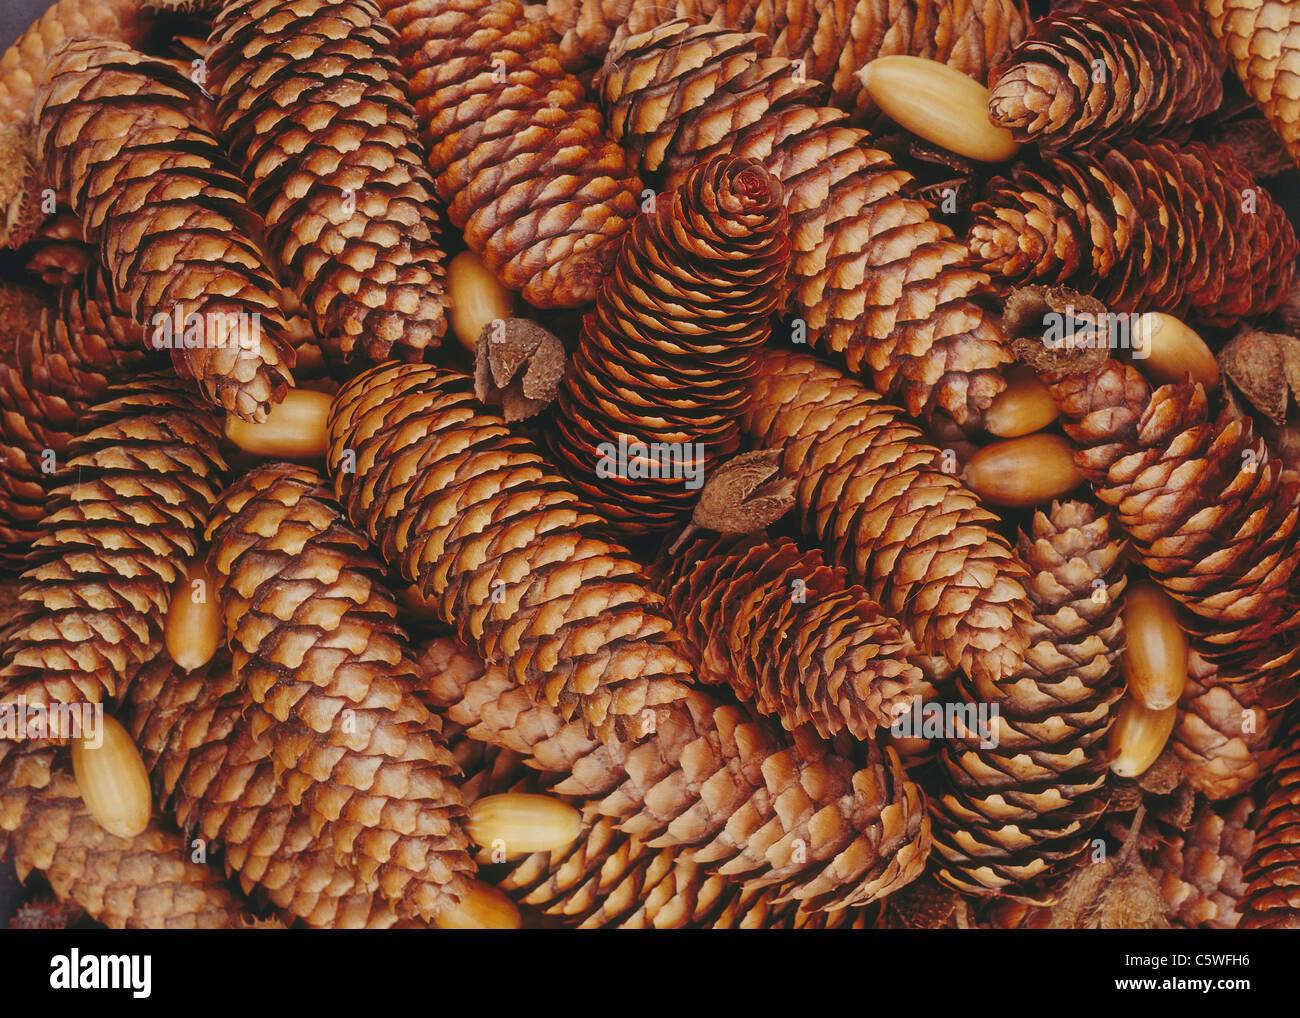 Conos de pinos, cerca de fondo Imagen De Stock